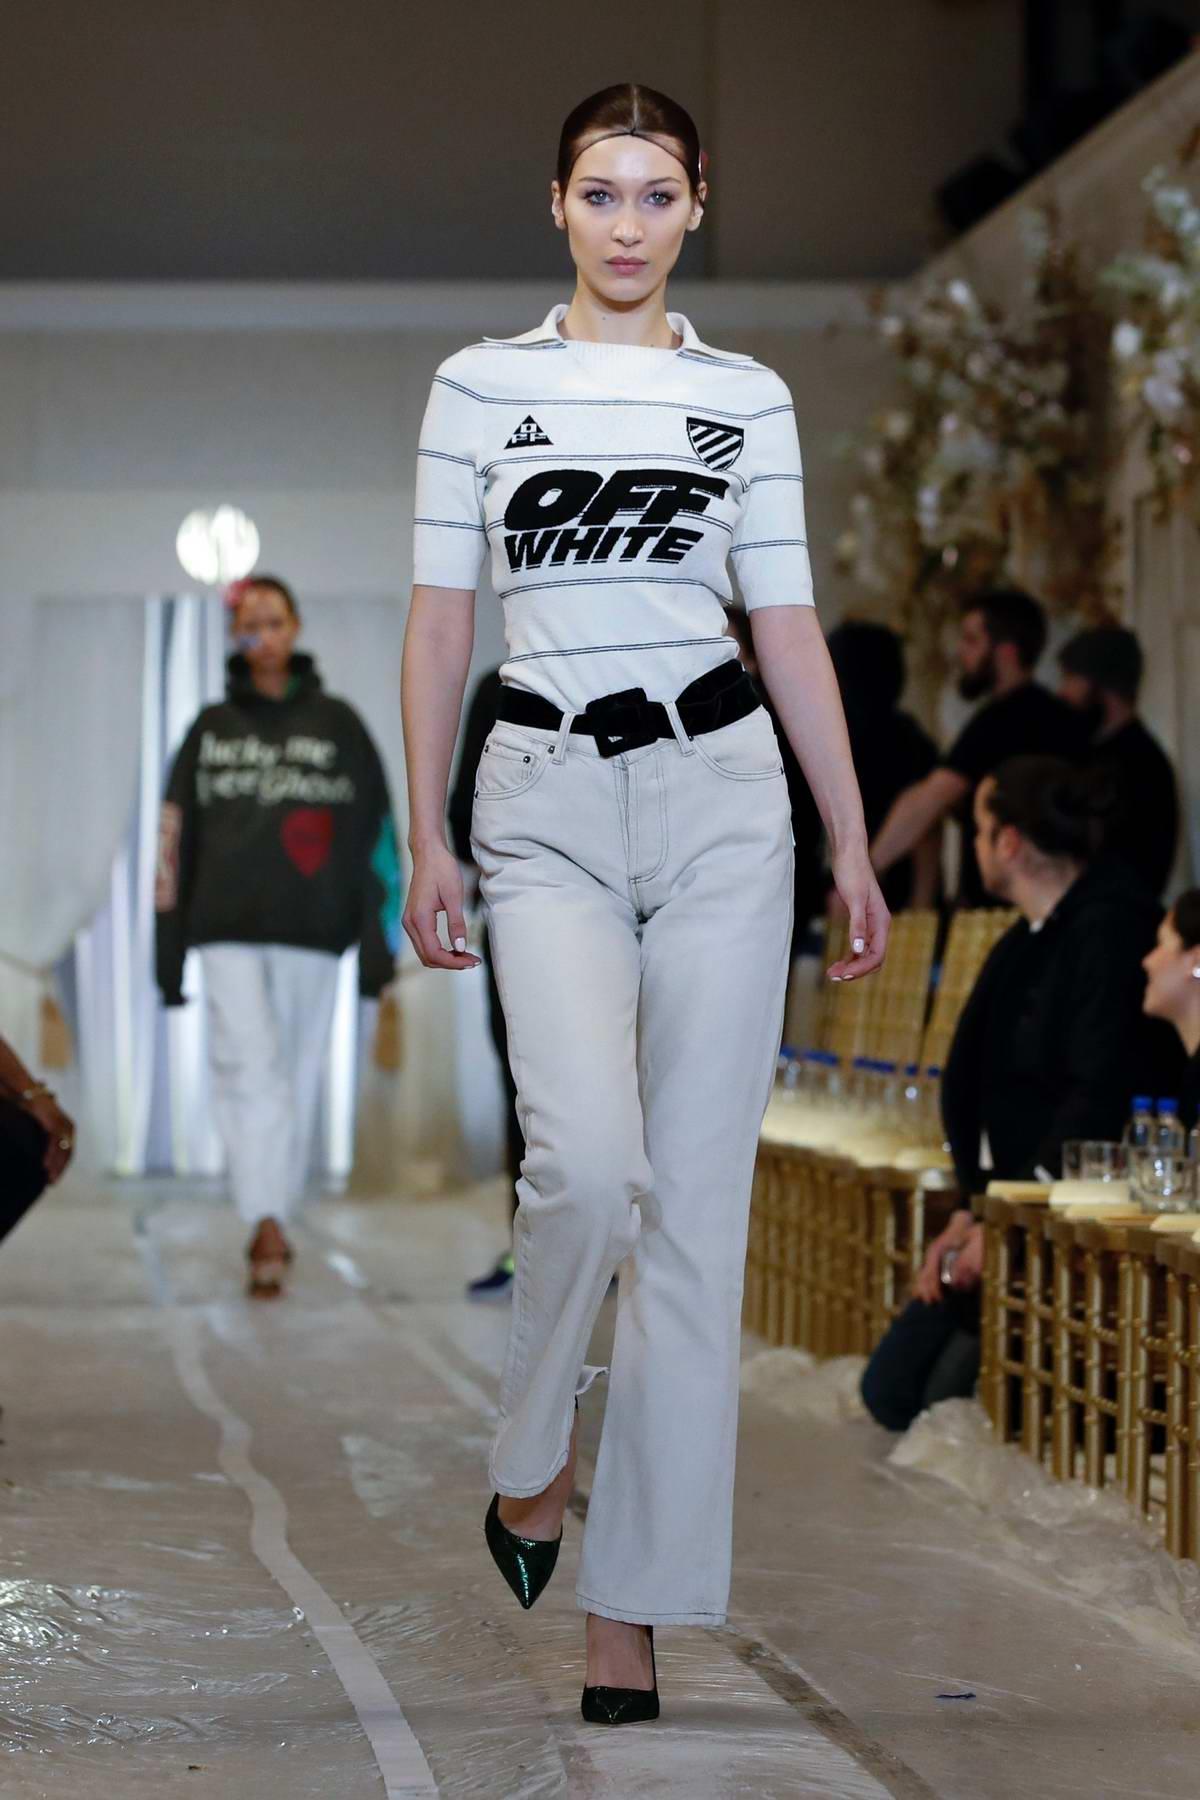 Bella Hadid walks the runway at the Brandon Maxwell show during New York Fashion Week in New York City